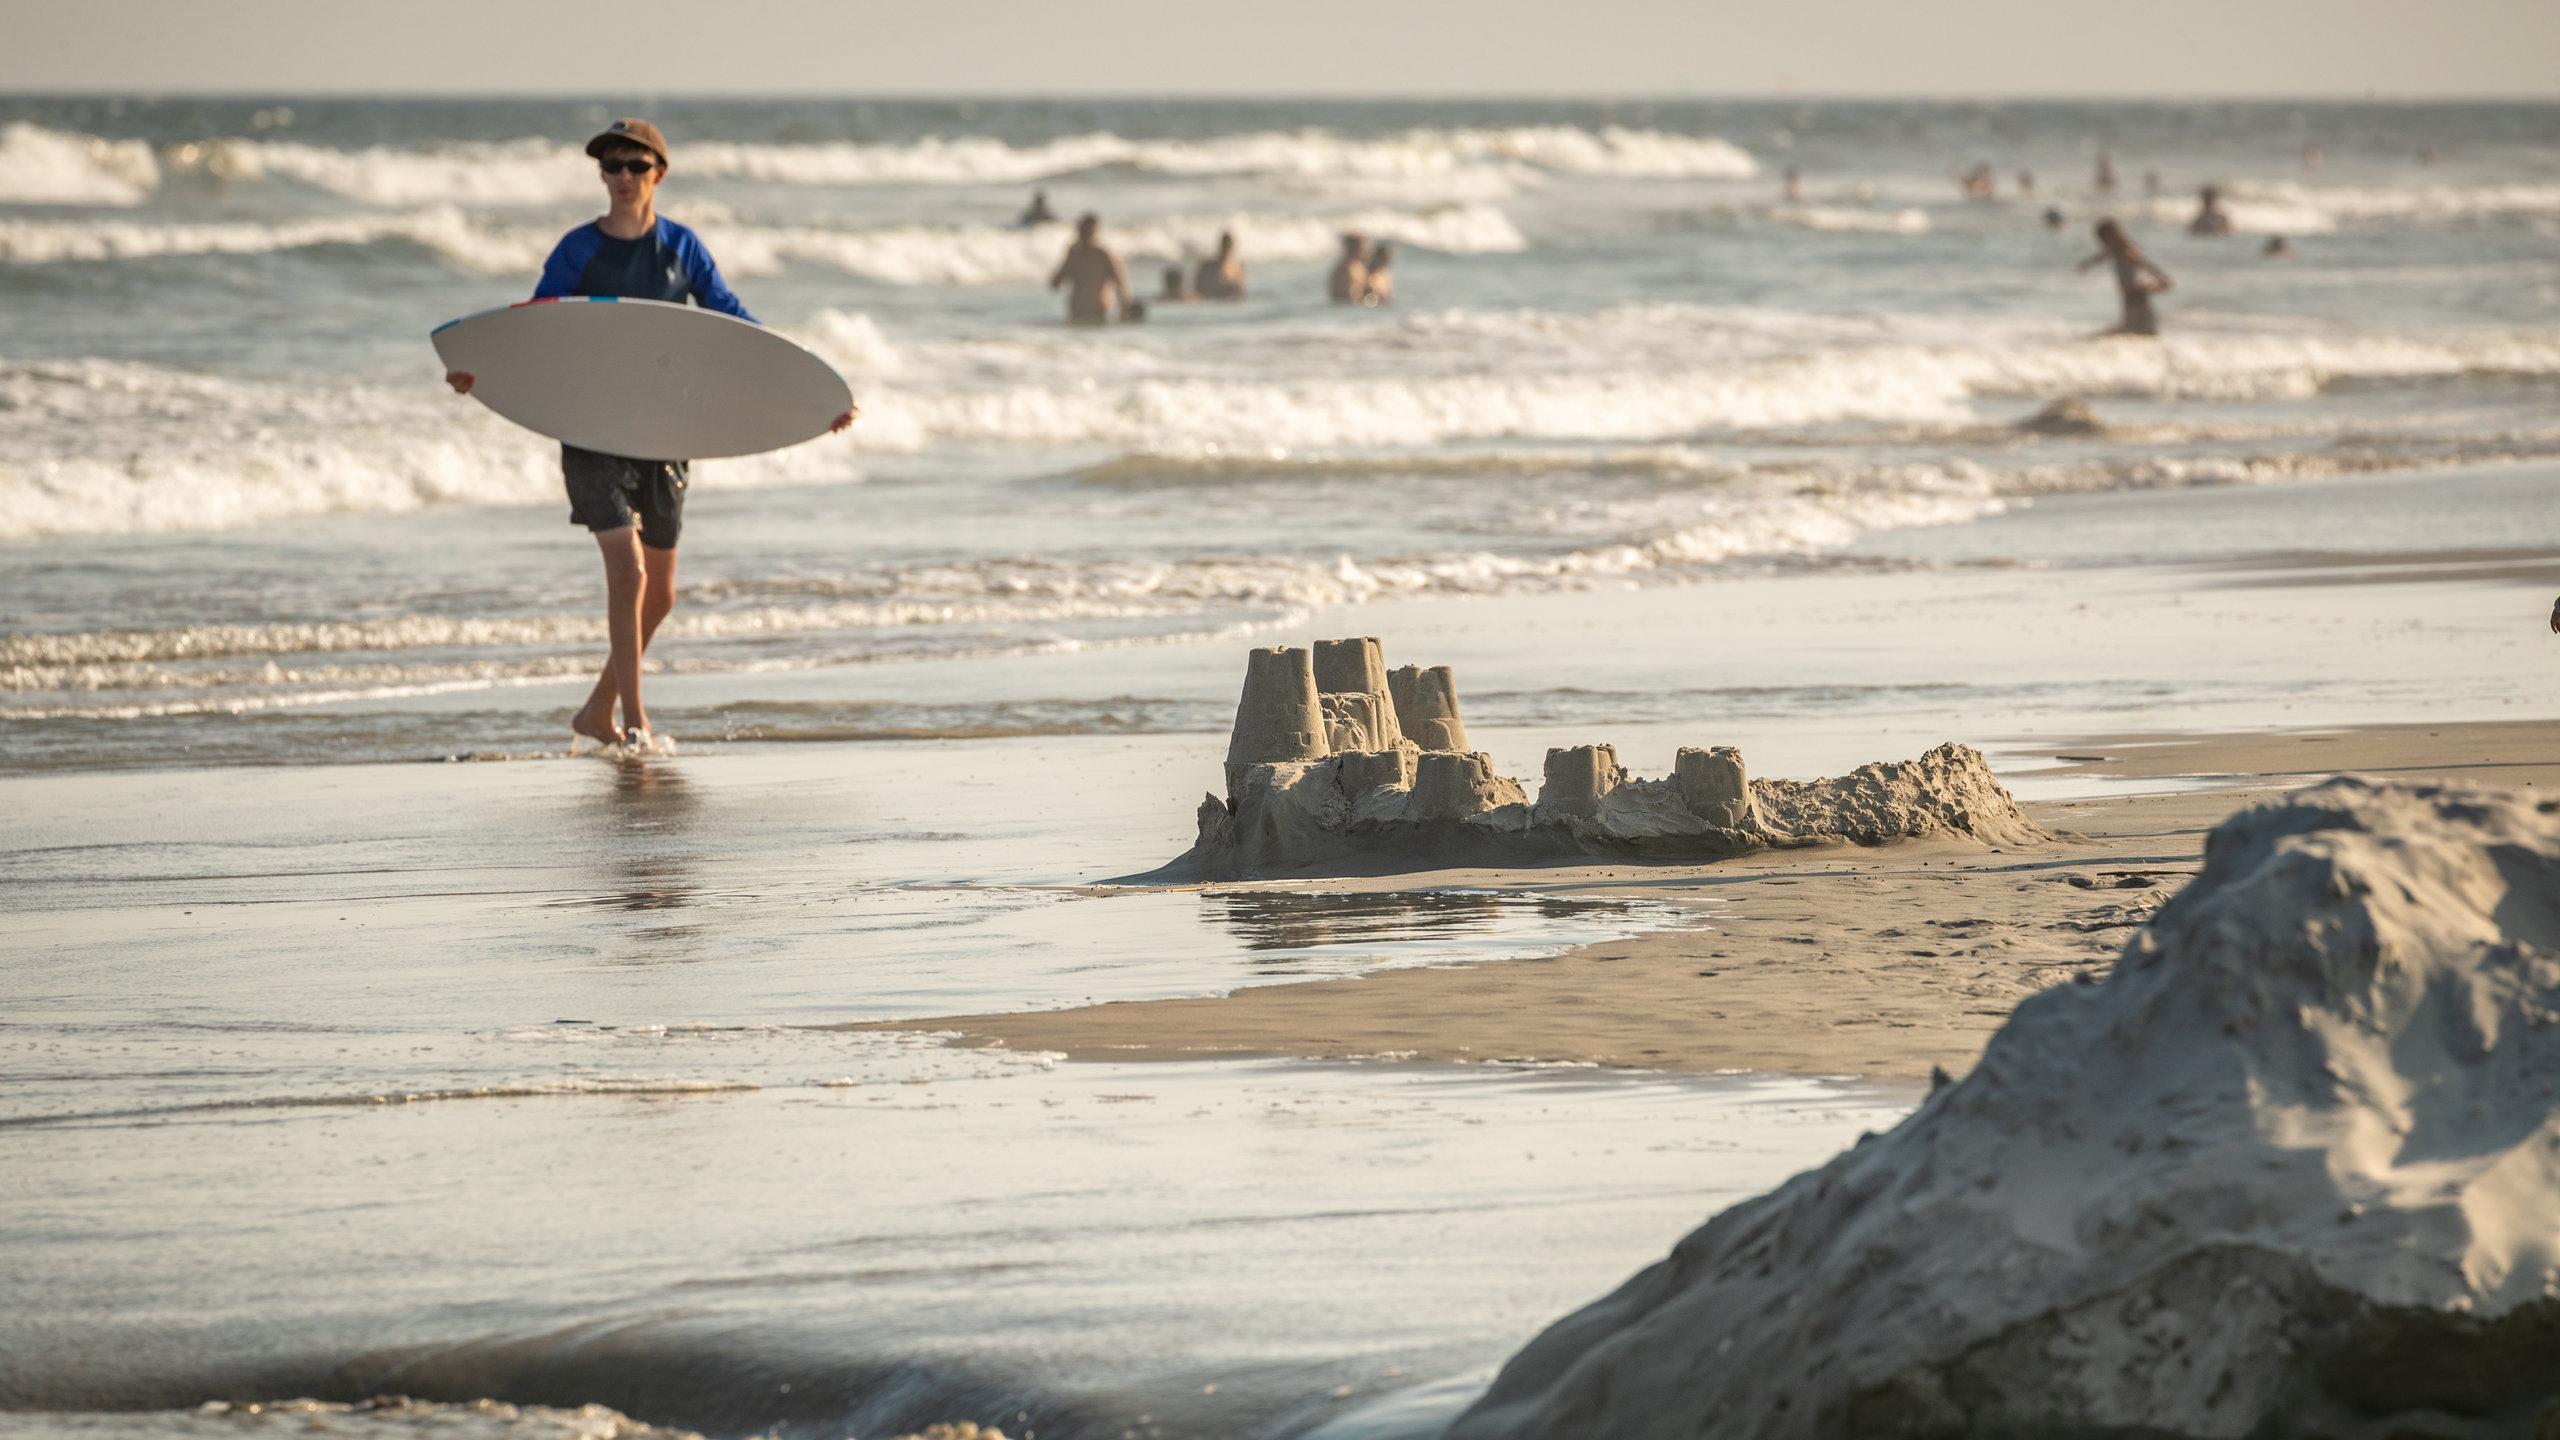 Wildwood Beach, New Jersey, United States of America